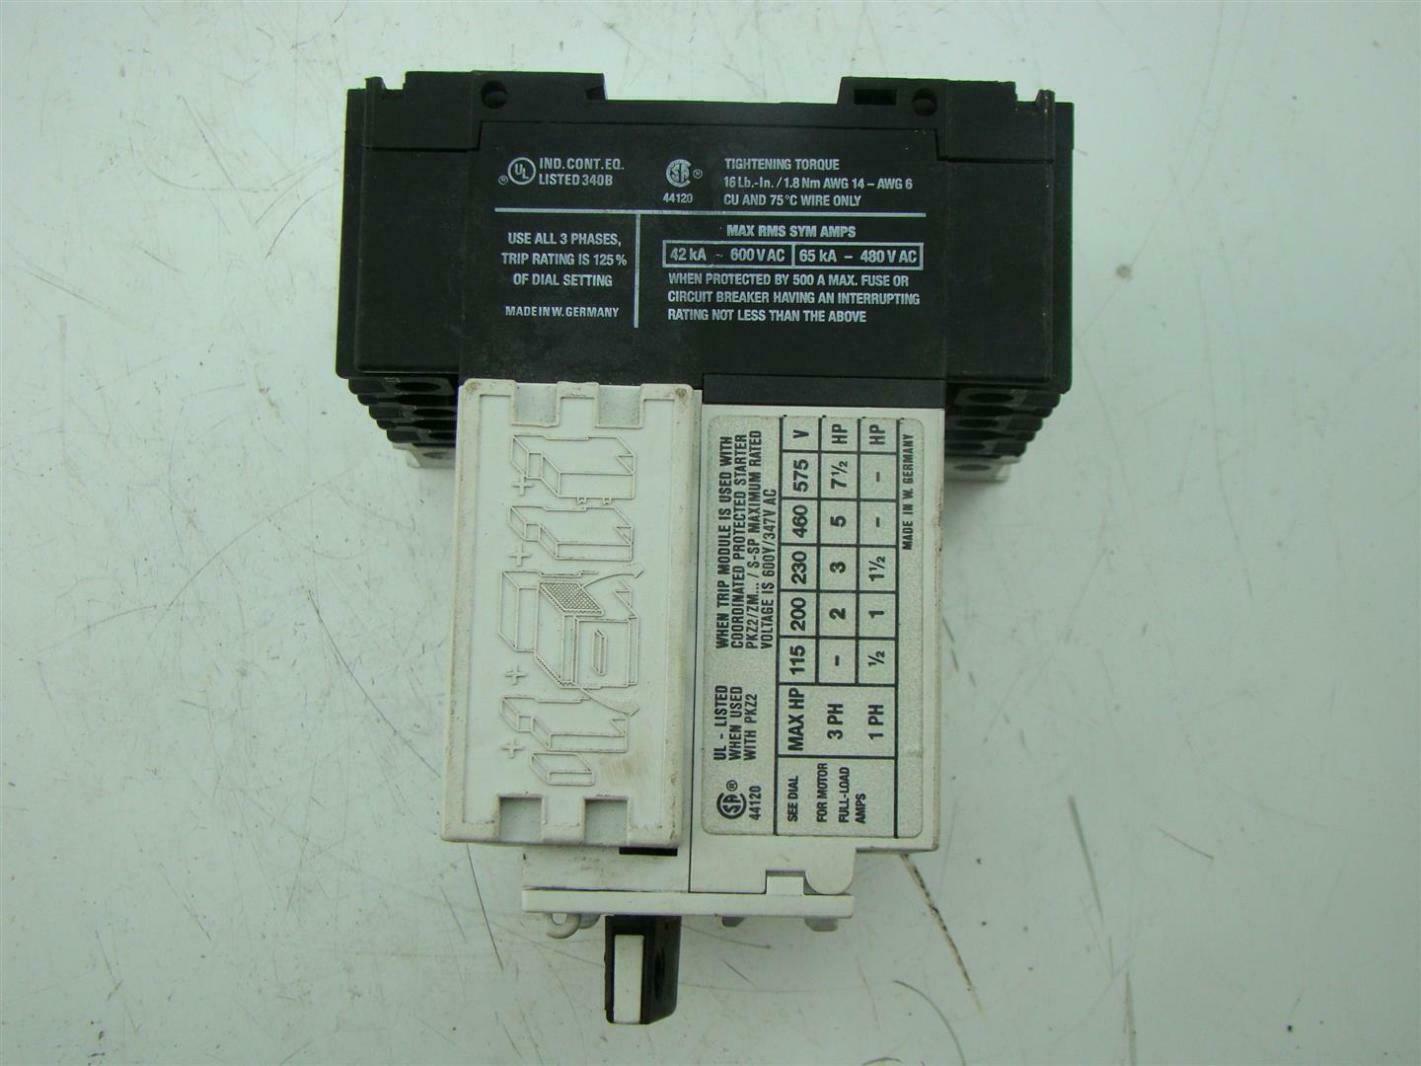 MOELLER PKZ2 3 PHASE 42KA- 600V AC 65 KA - 480 V AC   eBay